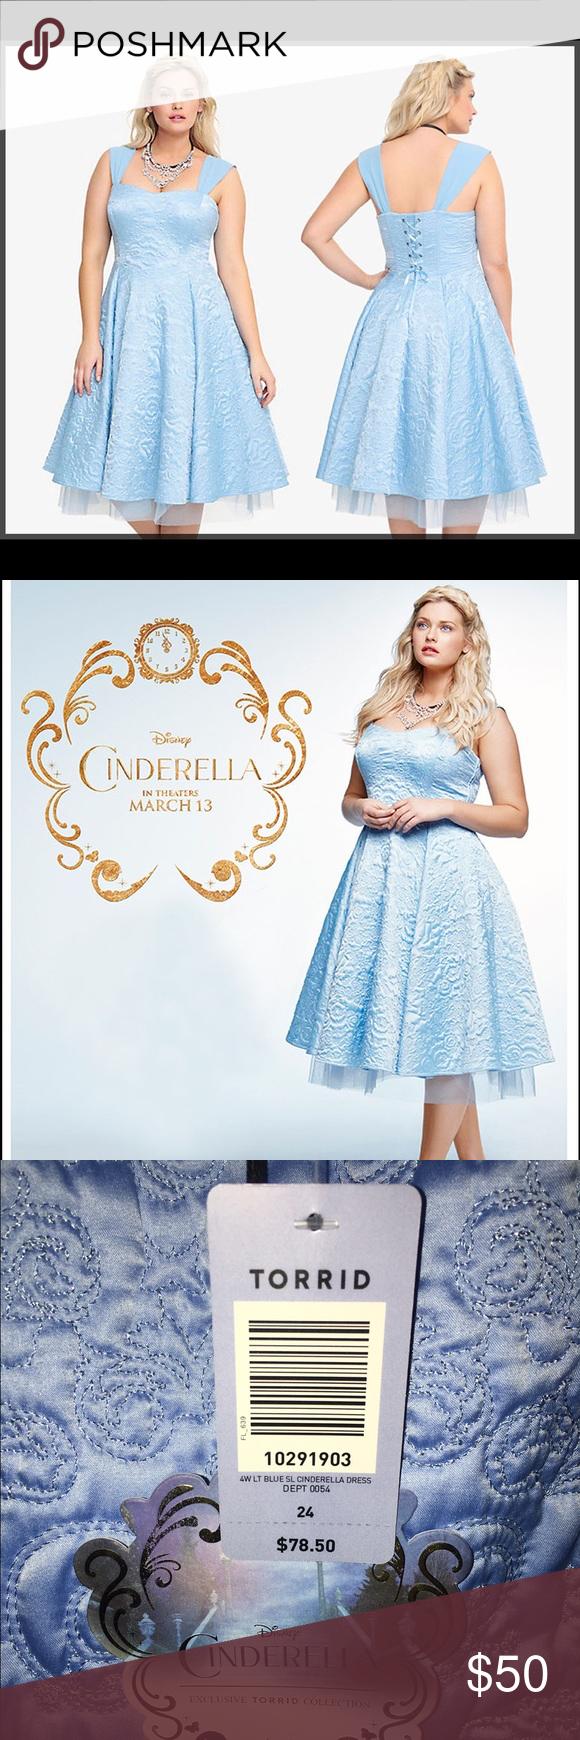 Torrid Cinderella Collection Cinderella Dress Beautiful carriage ...